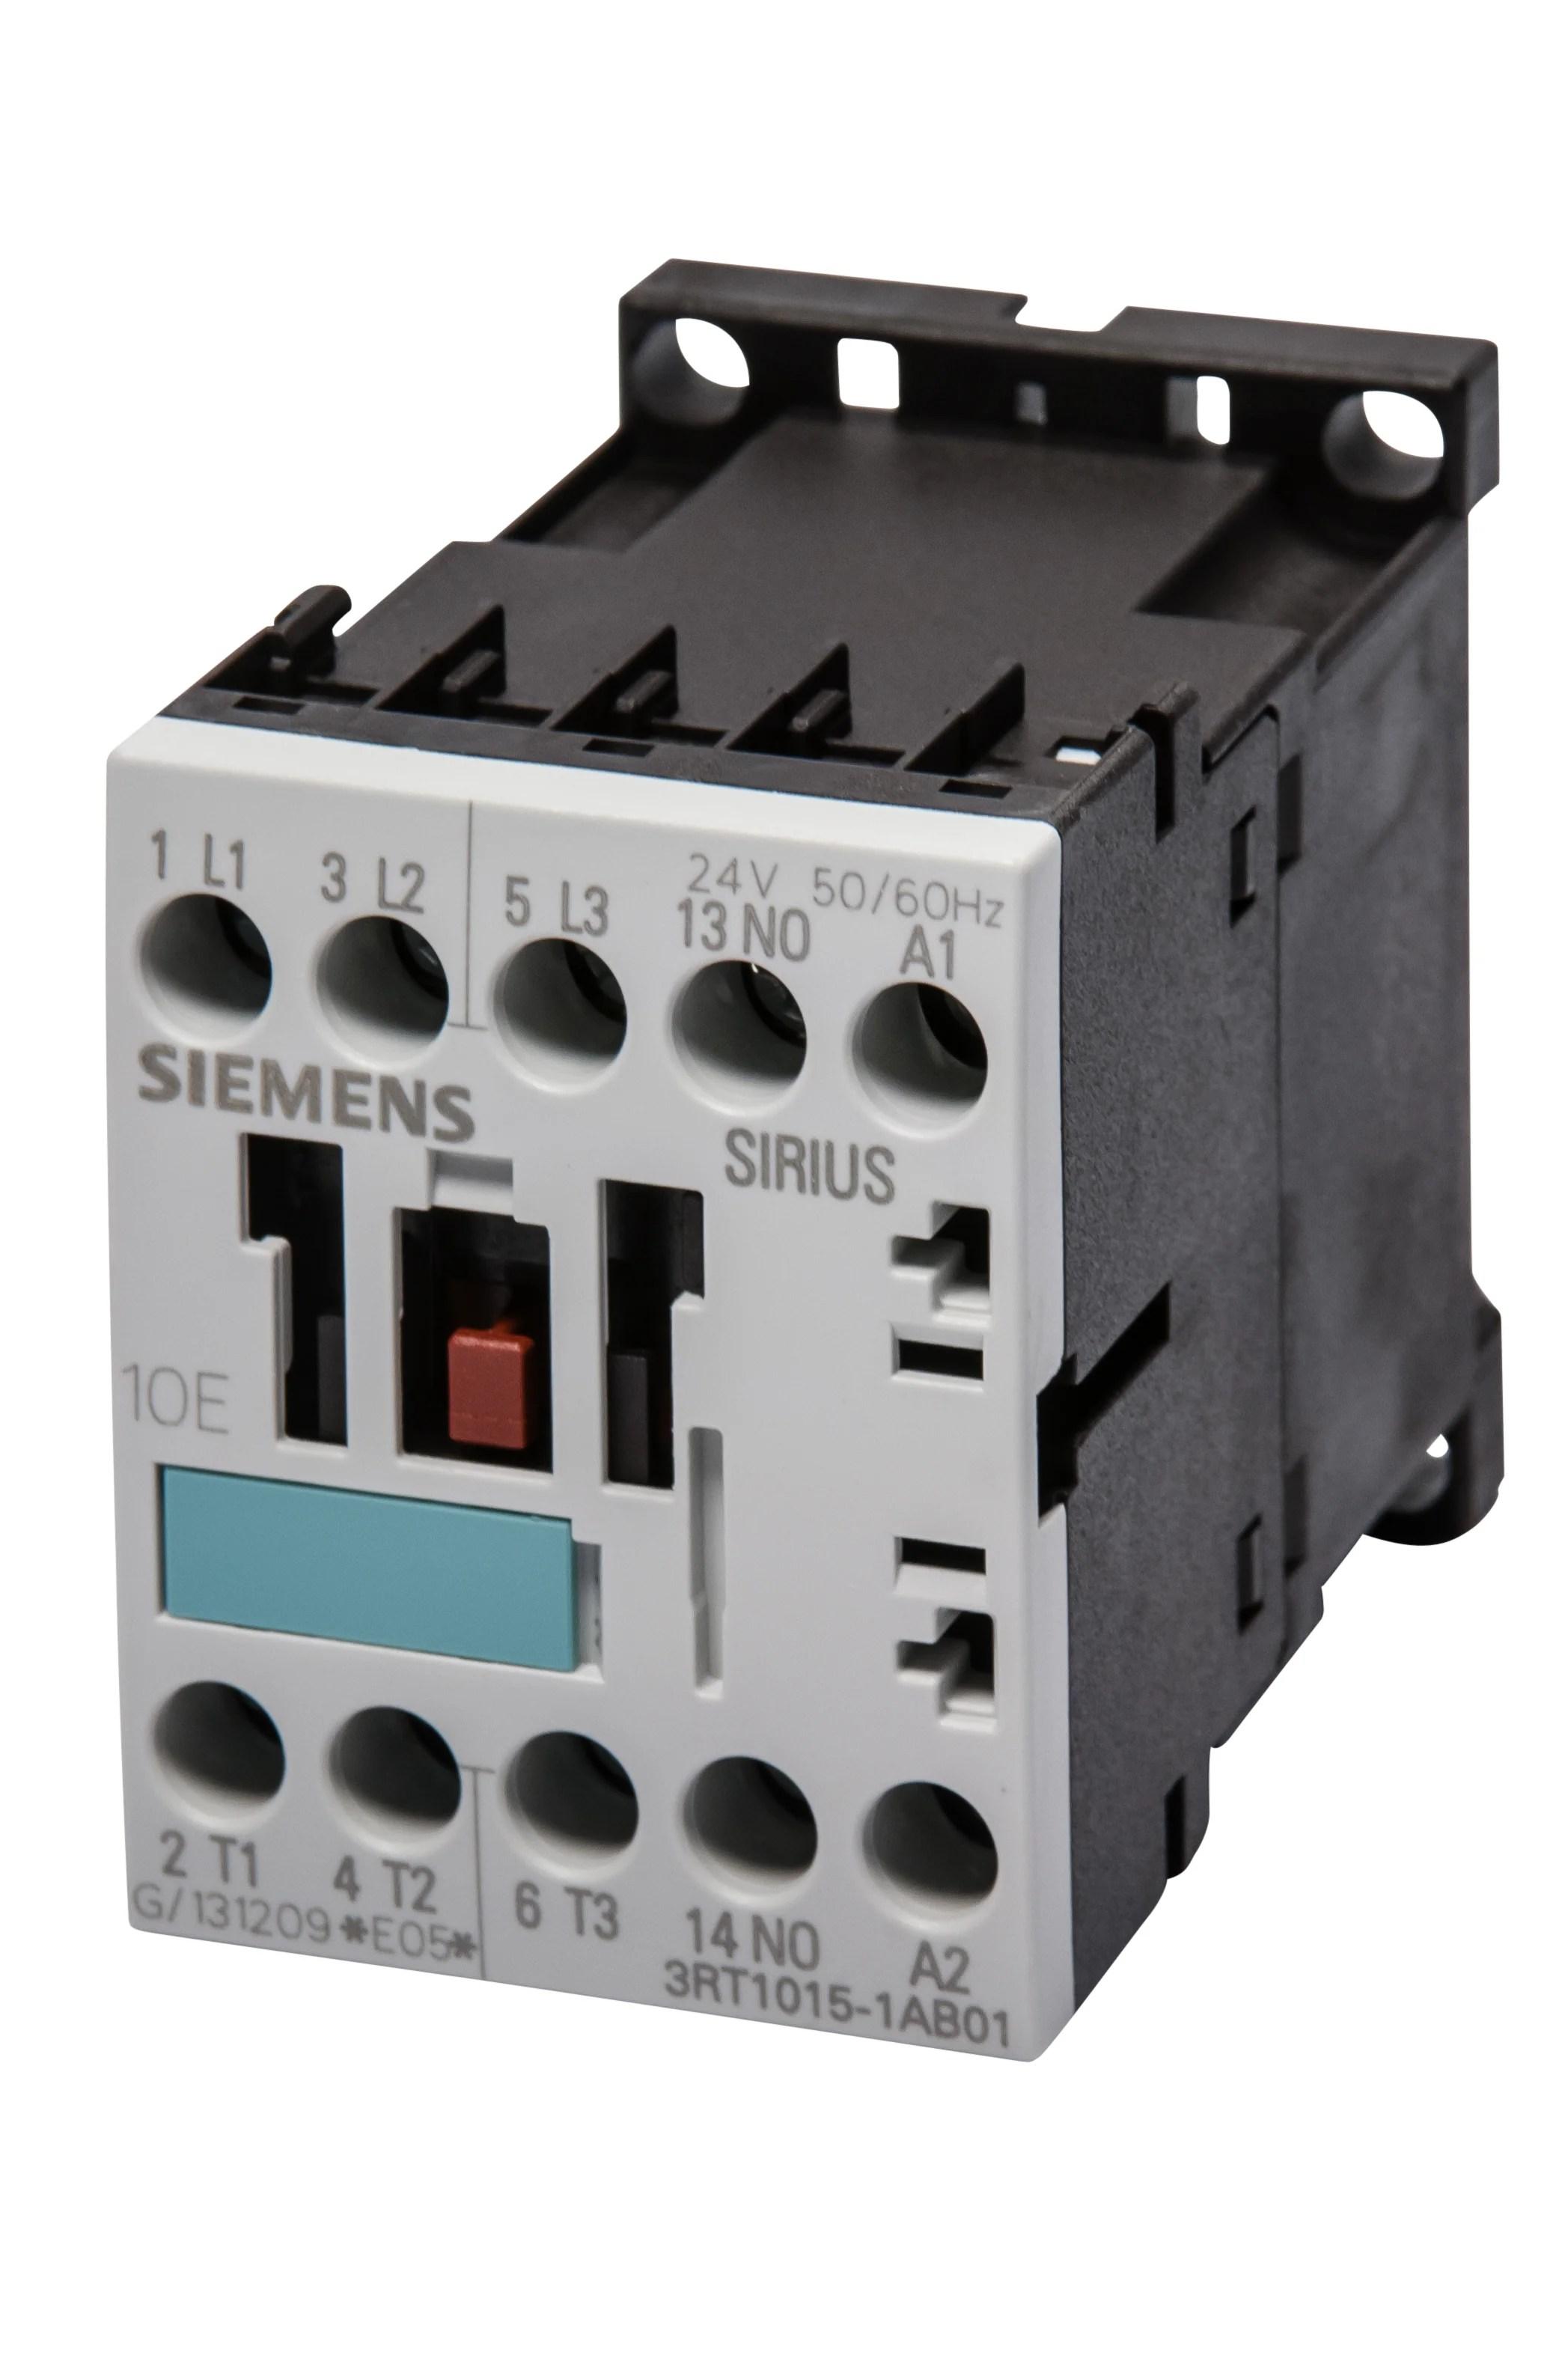 3RT1015 1A Siemens Sirius?resize=360%2C380 siemens motor starter wiring diagram the best wiring diagram 2017 furnas motor starter wiring diagram at n-0.co